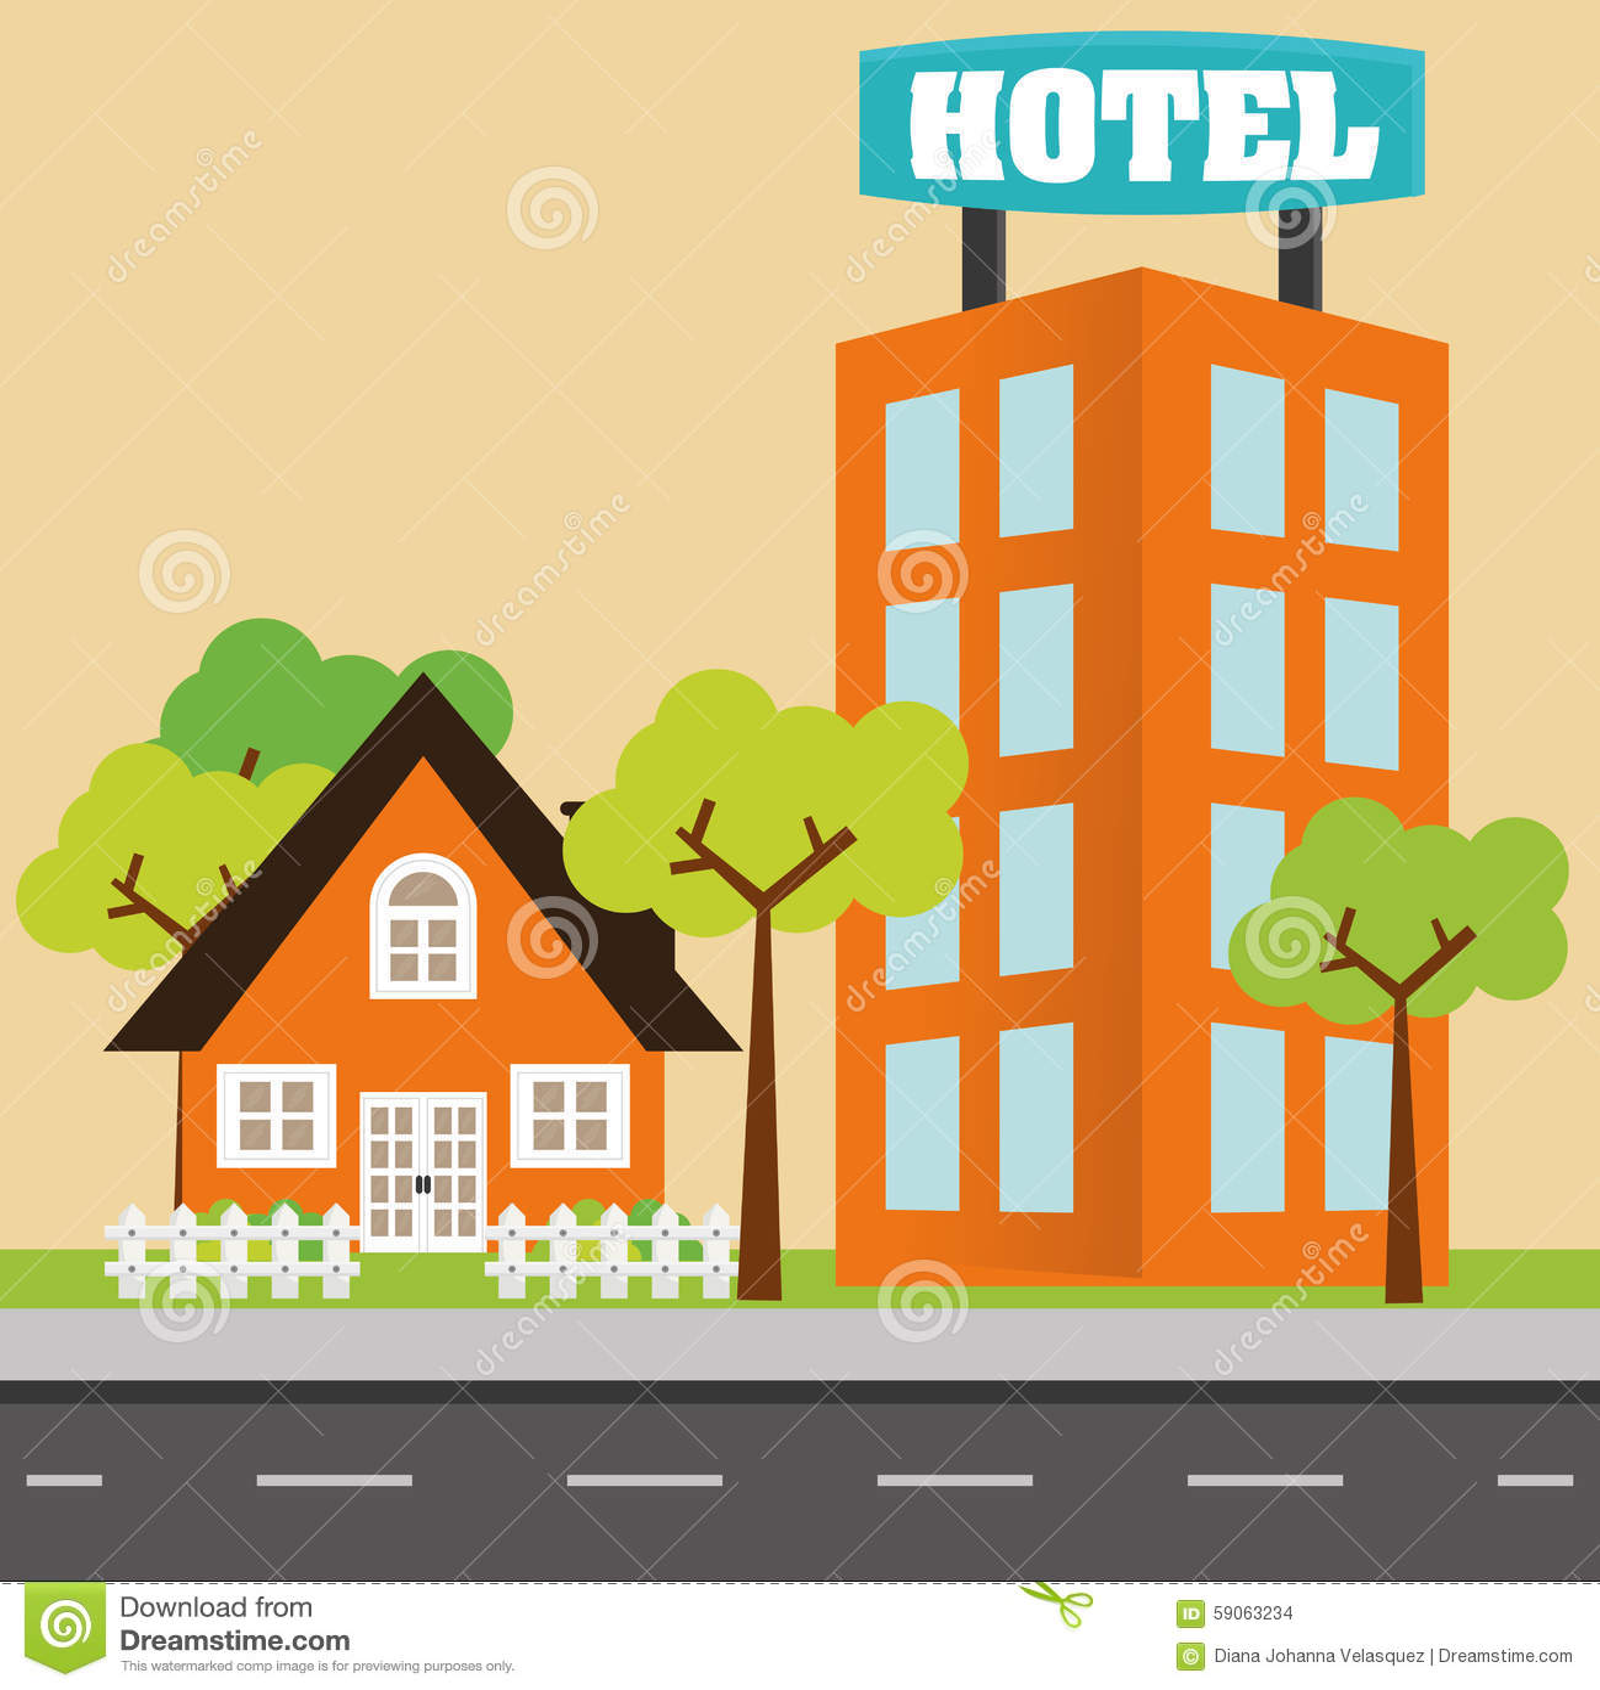 House design stock vector image 59063234 for Digital house design